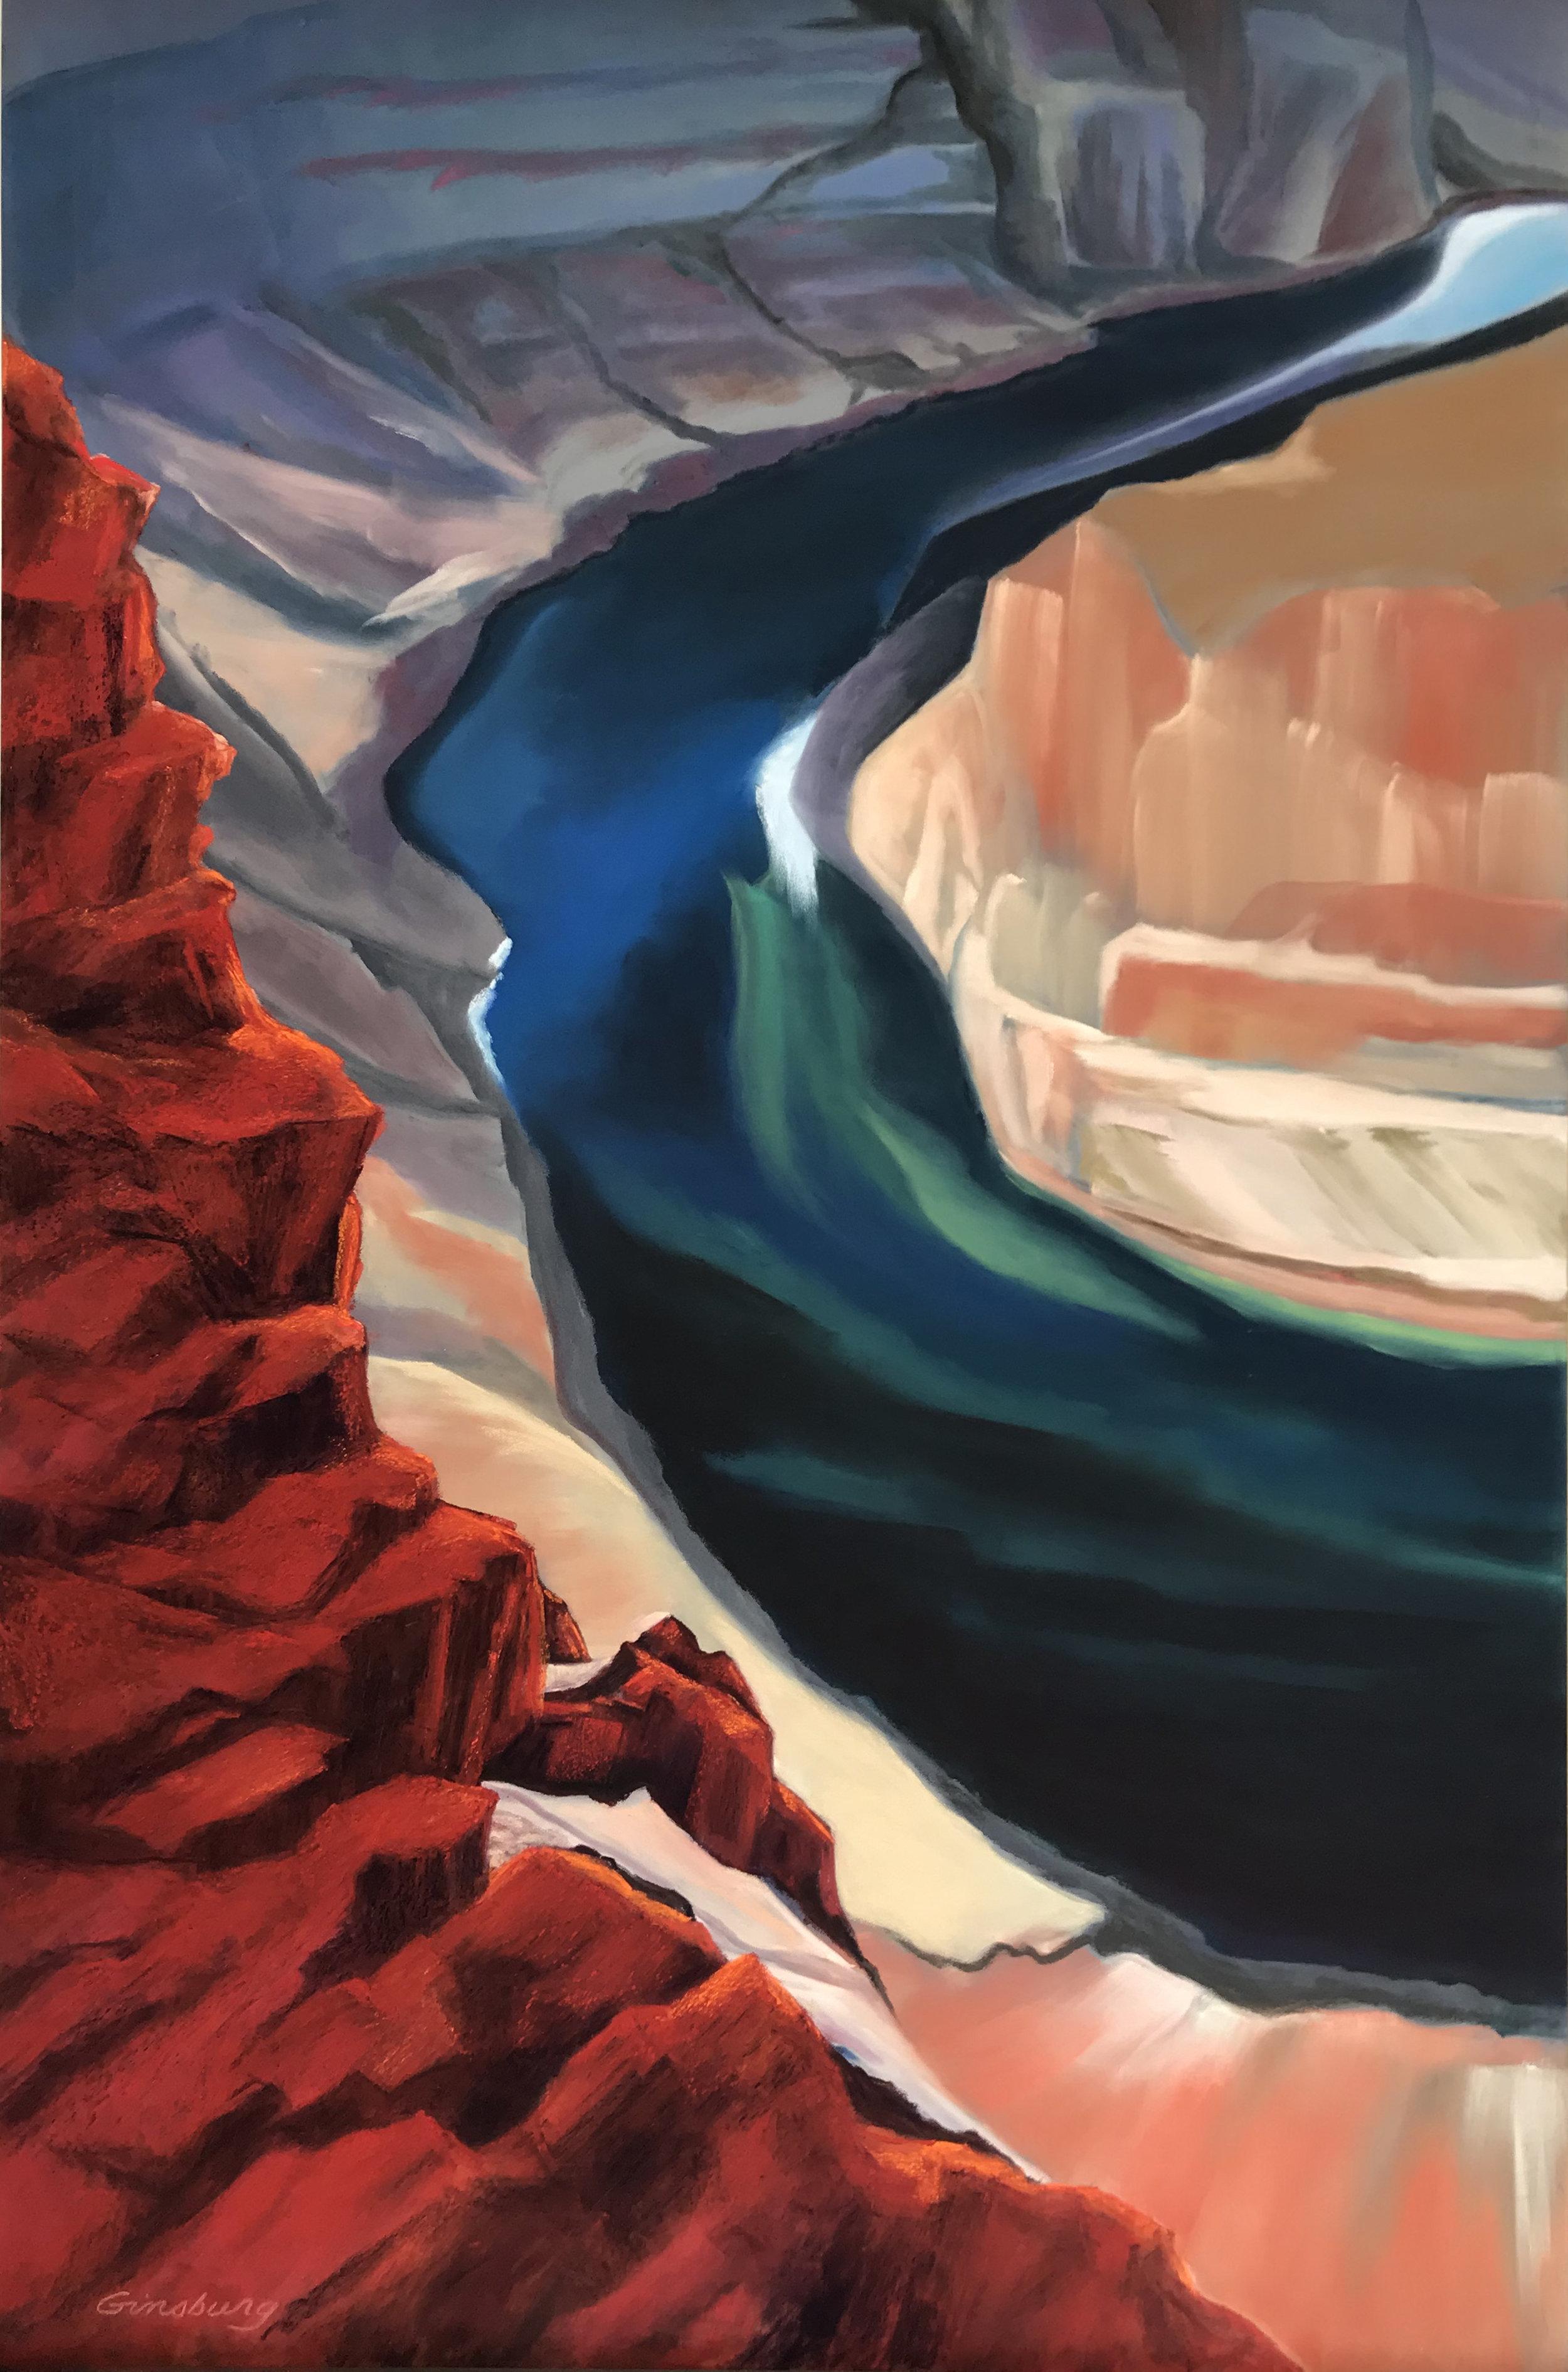 Jewel Of The Canyon  Horshoe Canyon, Arizona  24 x 36  PanPastel and Terry Ludwig Pastels on Ampersand Pastelbord  Cheri Ginsburg©